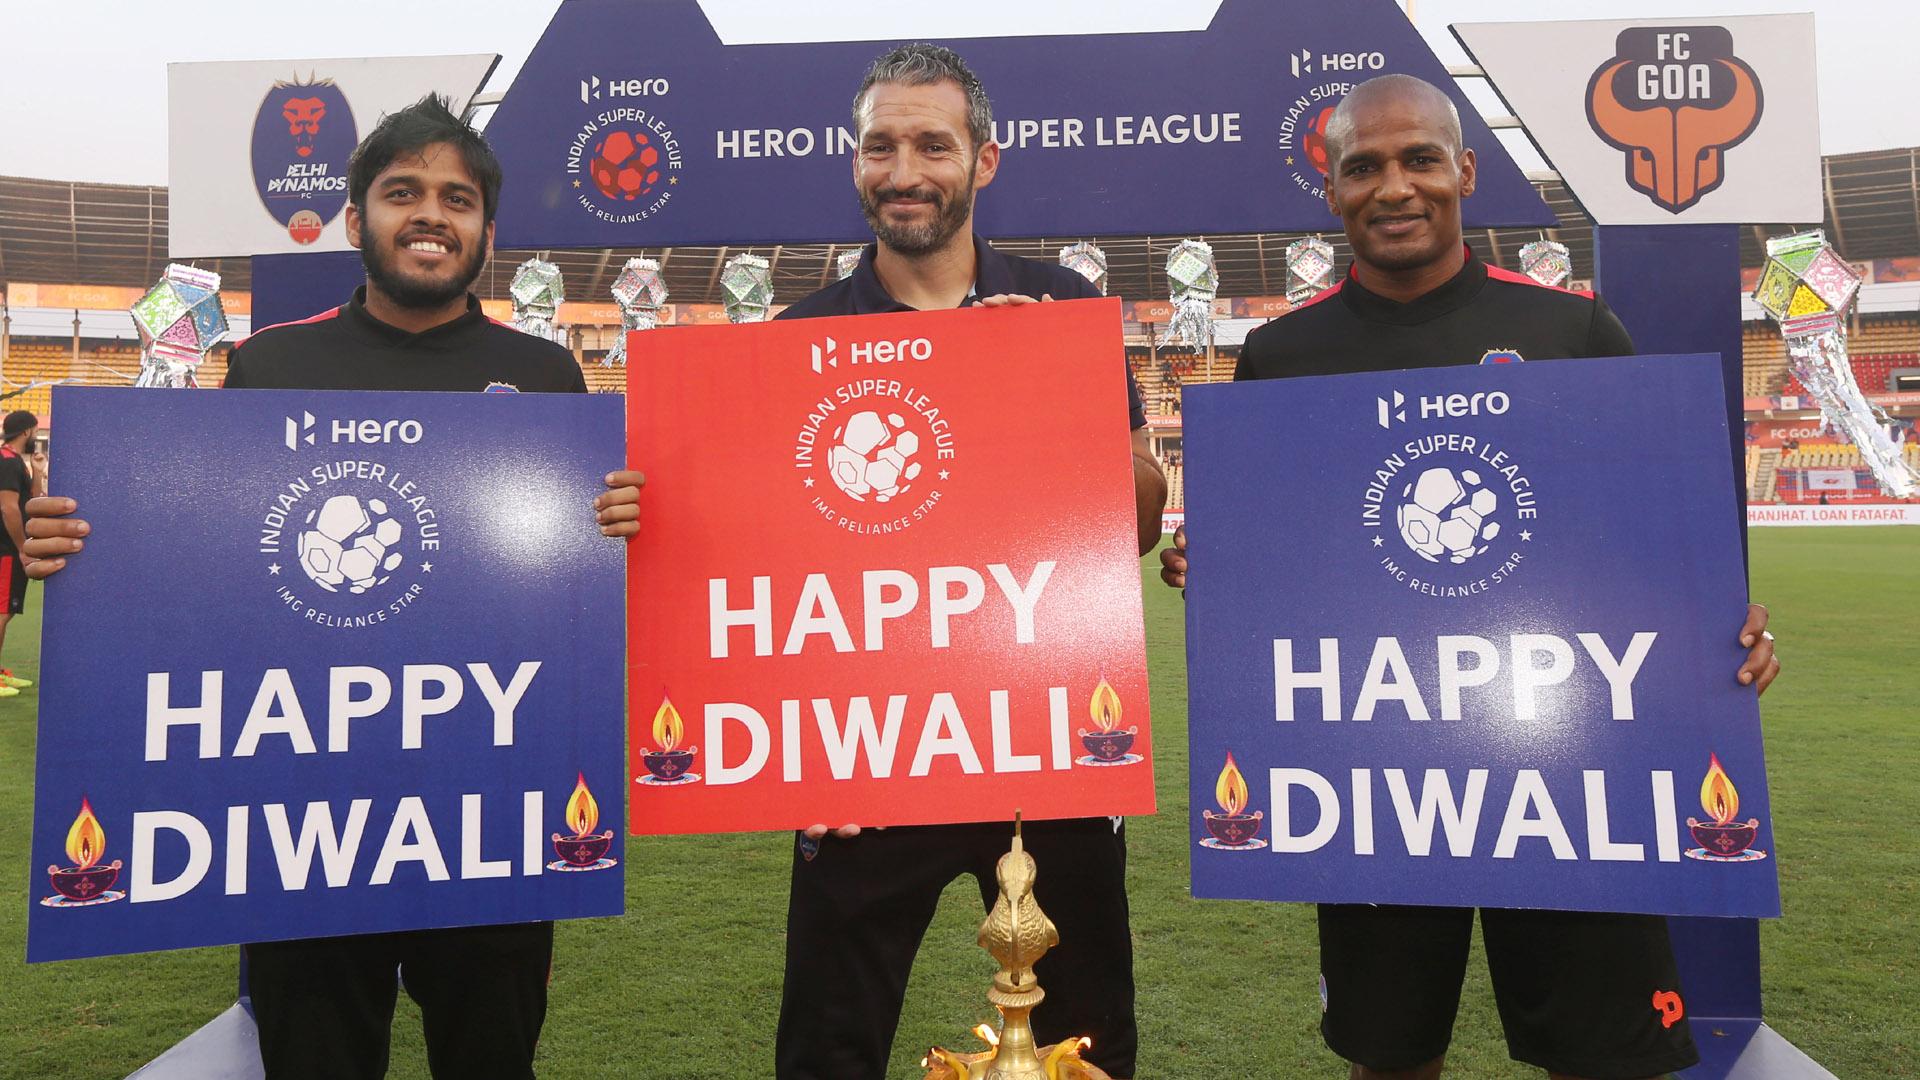 Sauvik Chakraborty Gianluca Zambrotta Florent Malouda FC Goa Delhi Dynamos FC ISL season 3 2016